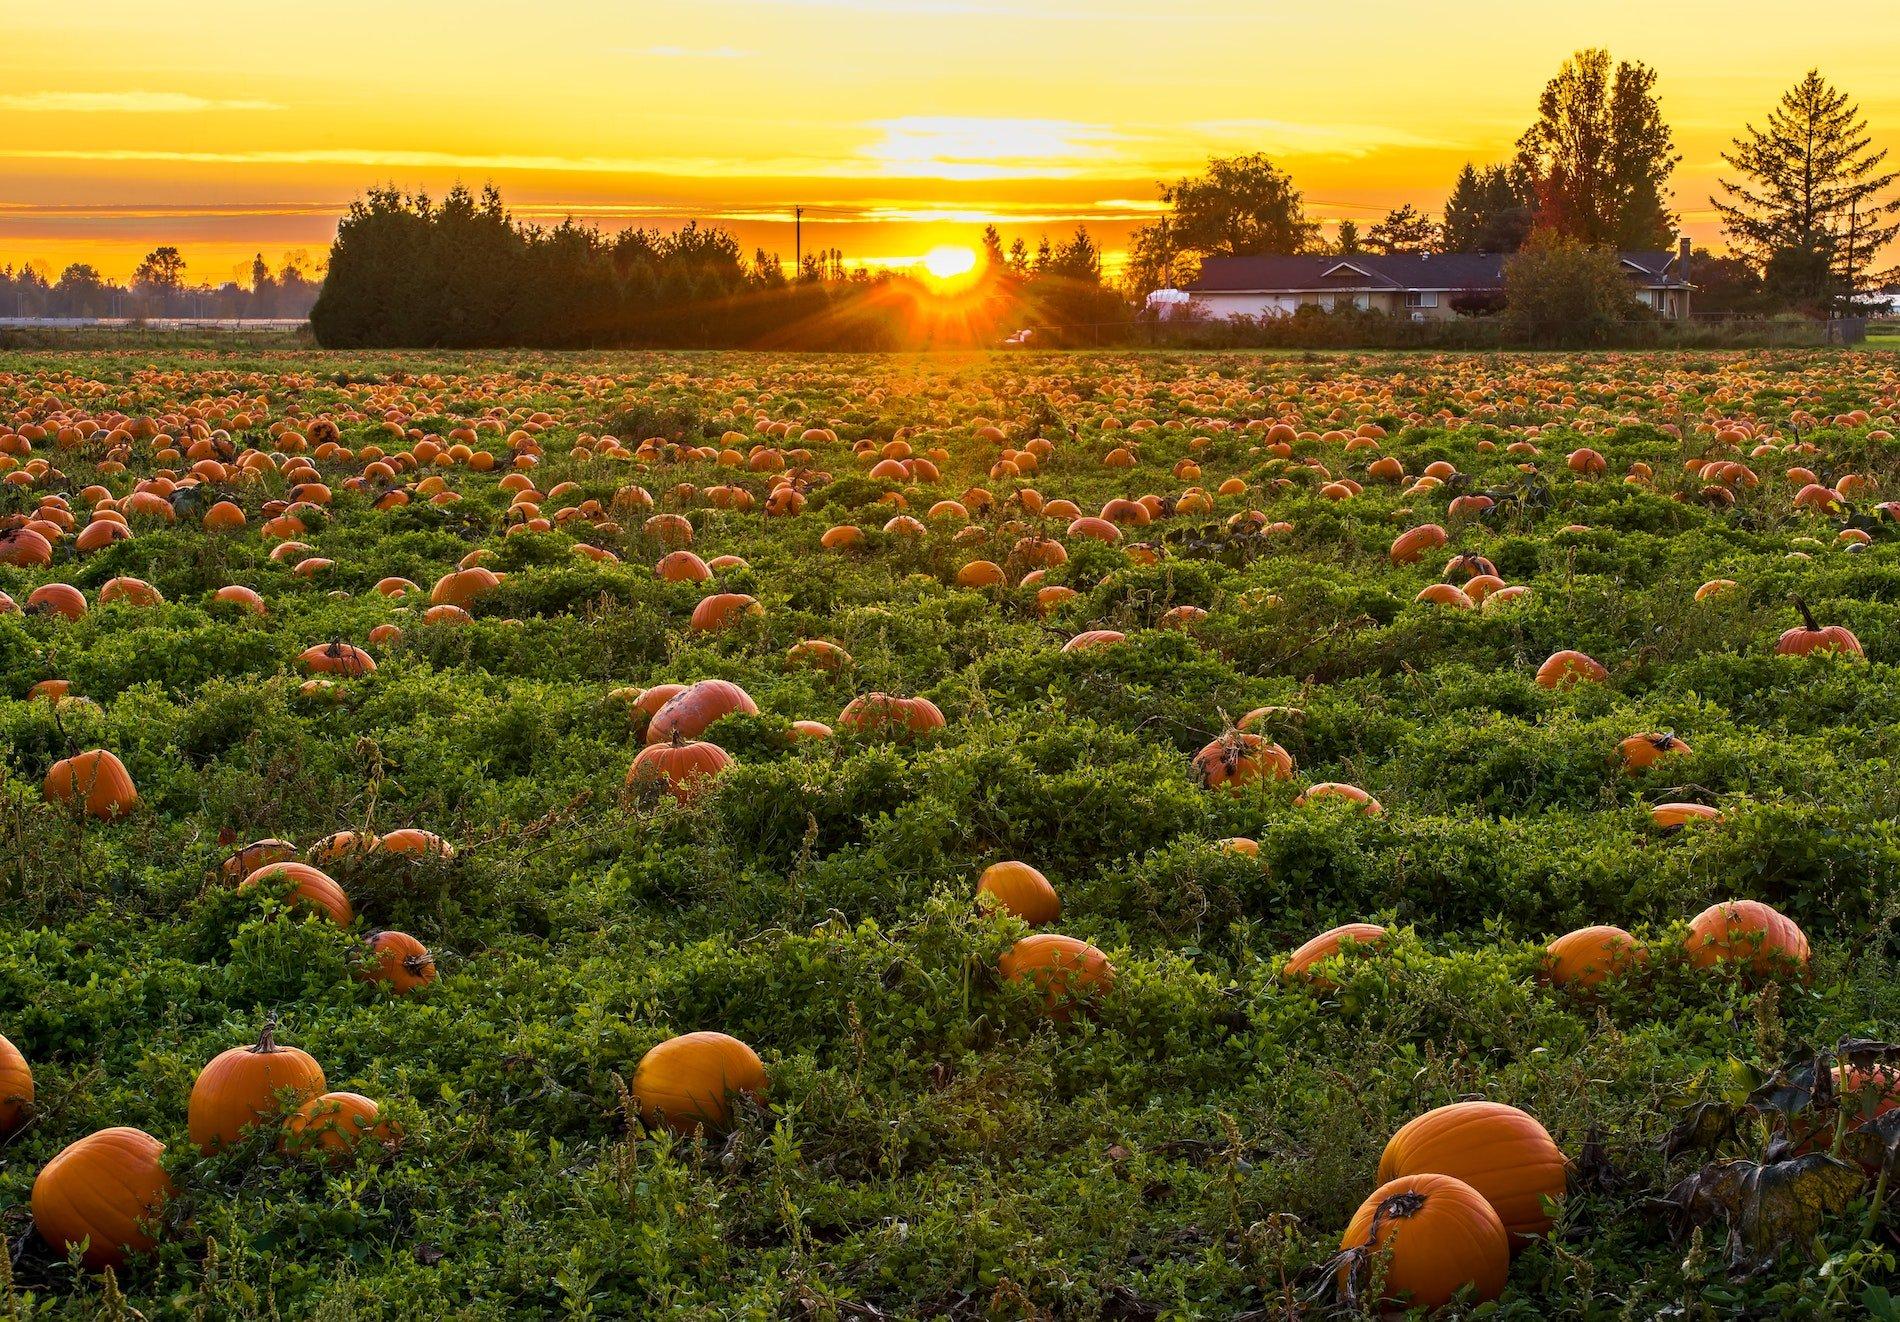 Pumpkin Patch Openings around Nashville, Tennessee